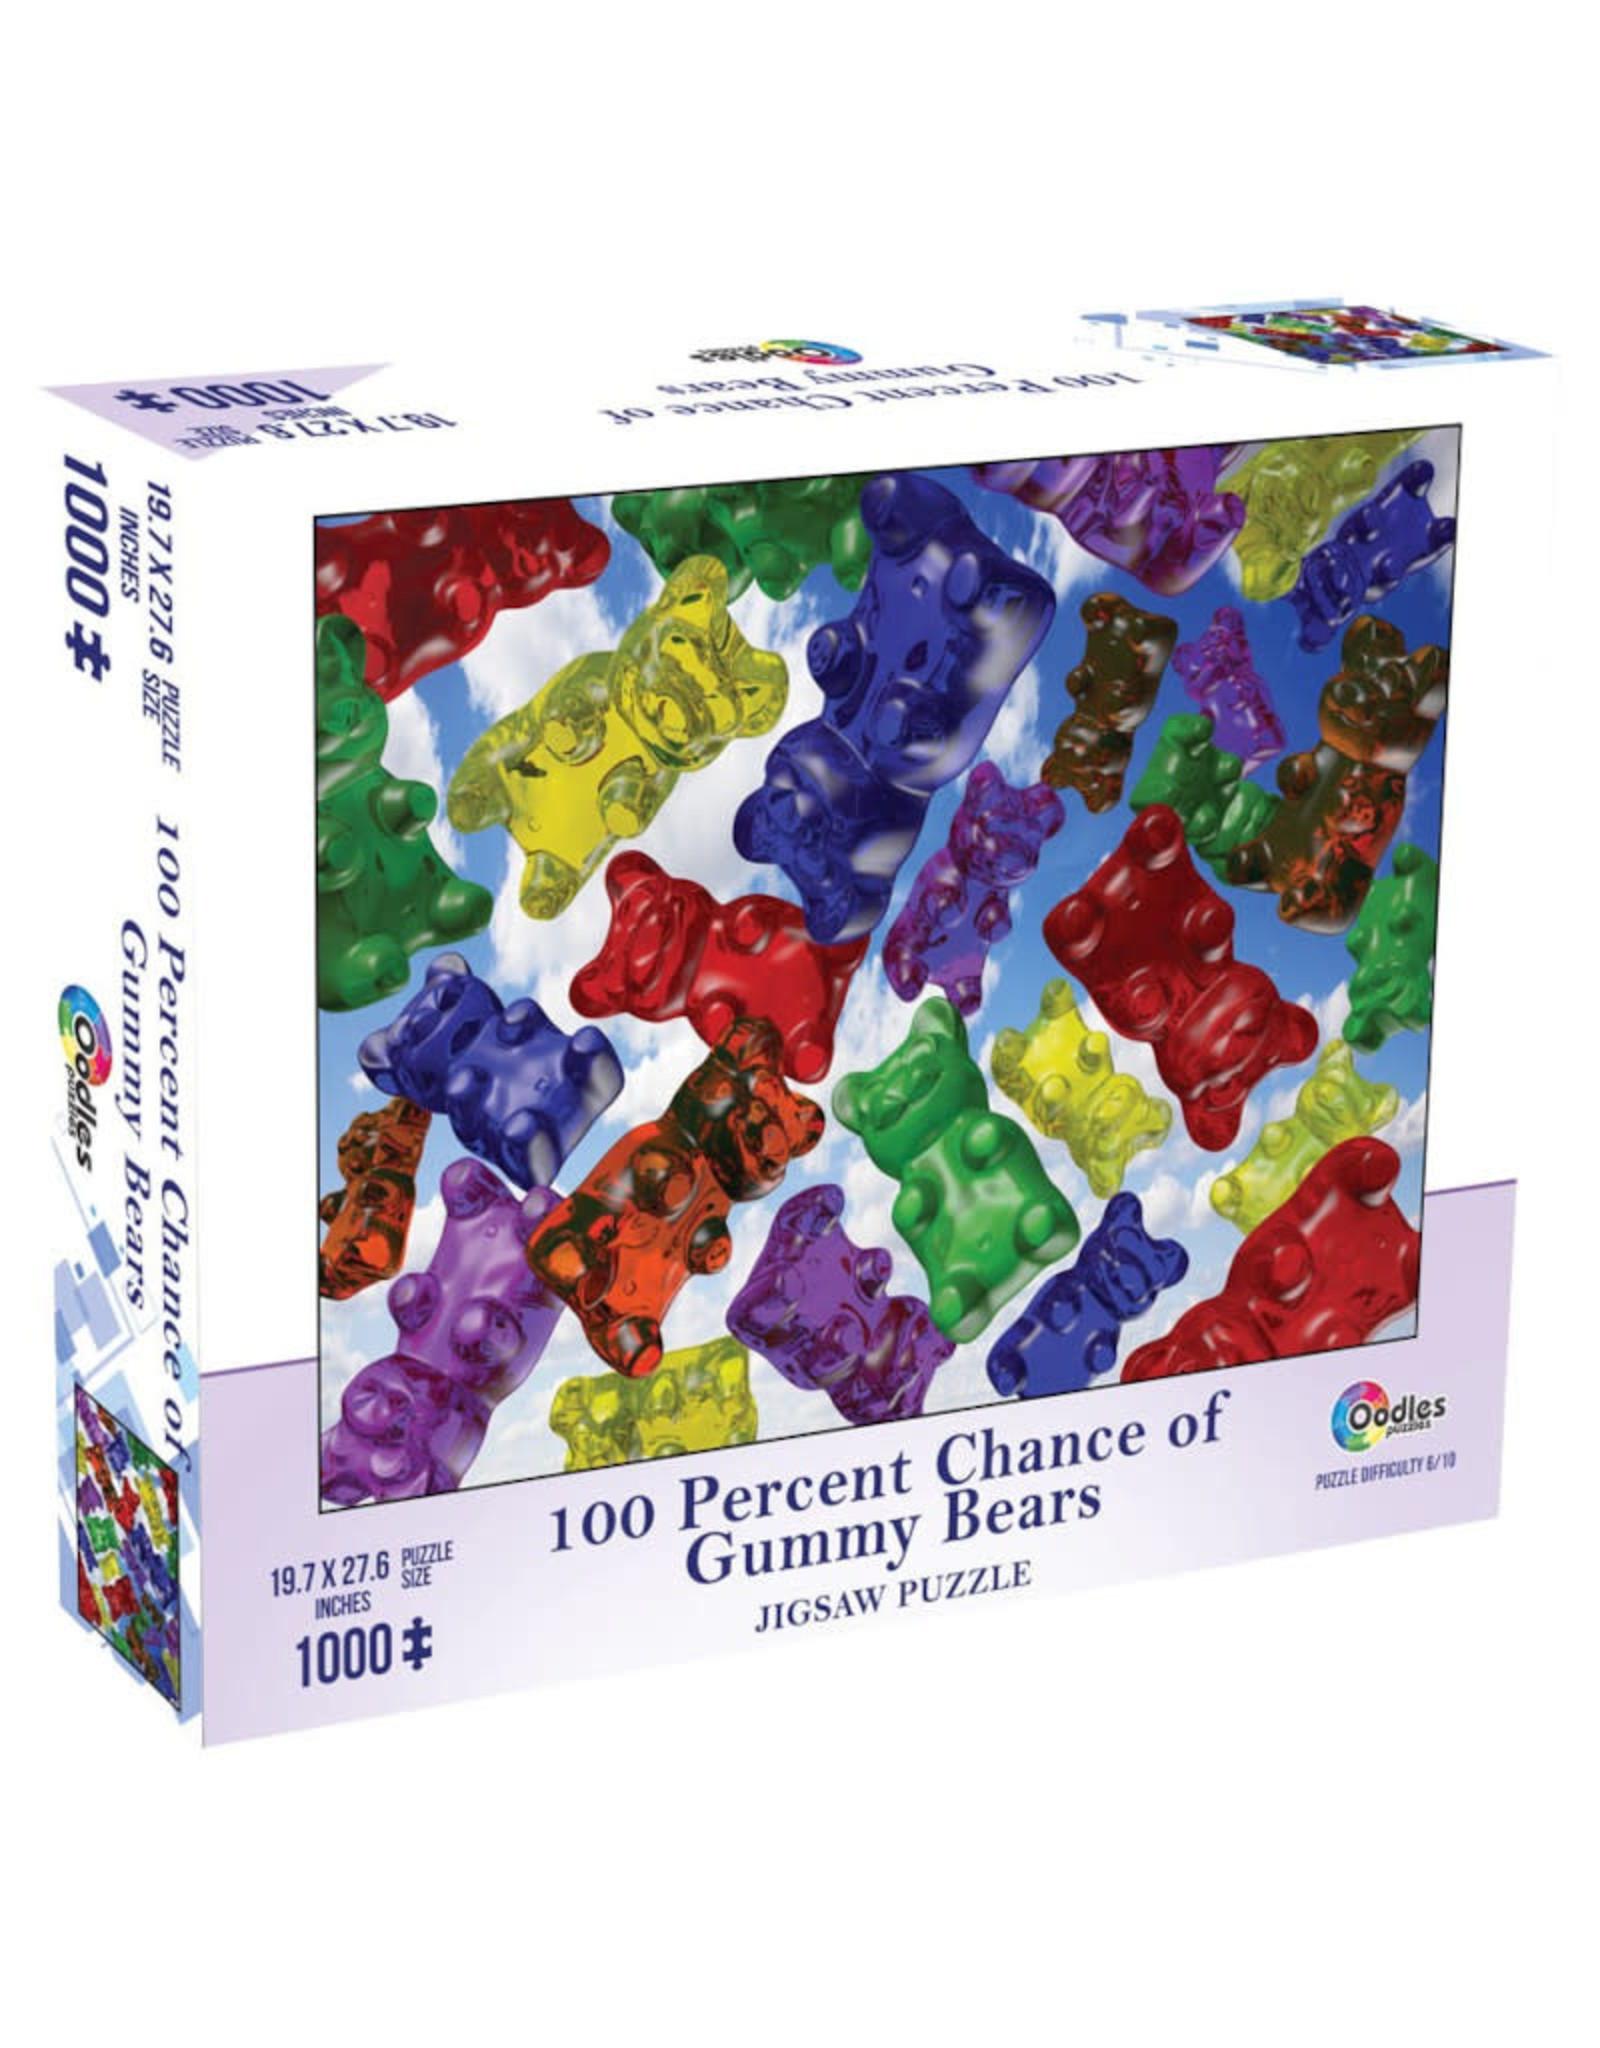 Mchezo 100% Chance of Gummy Bears Puzzle 1000 PCS